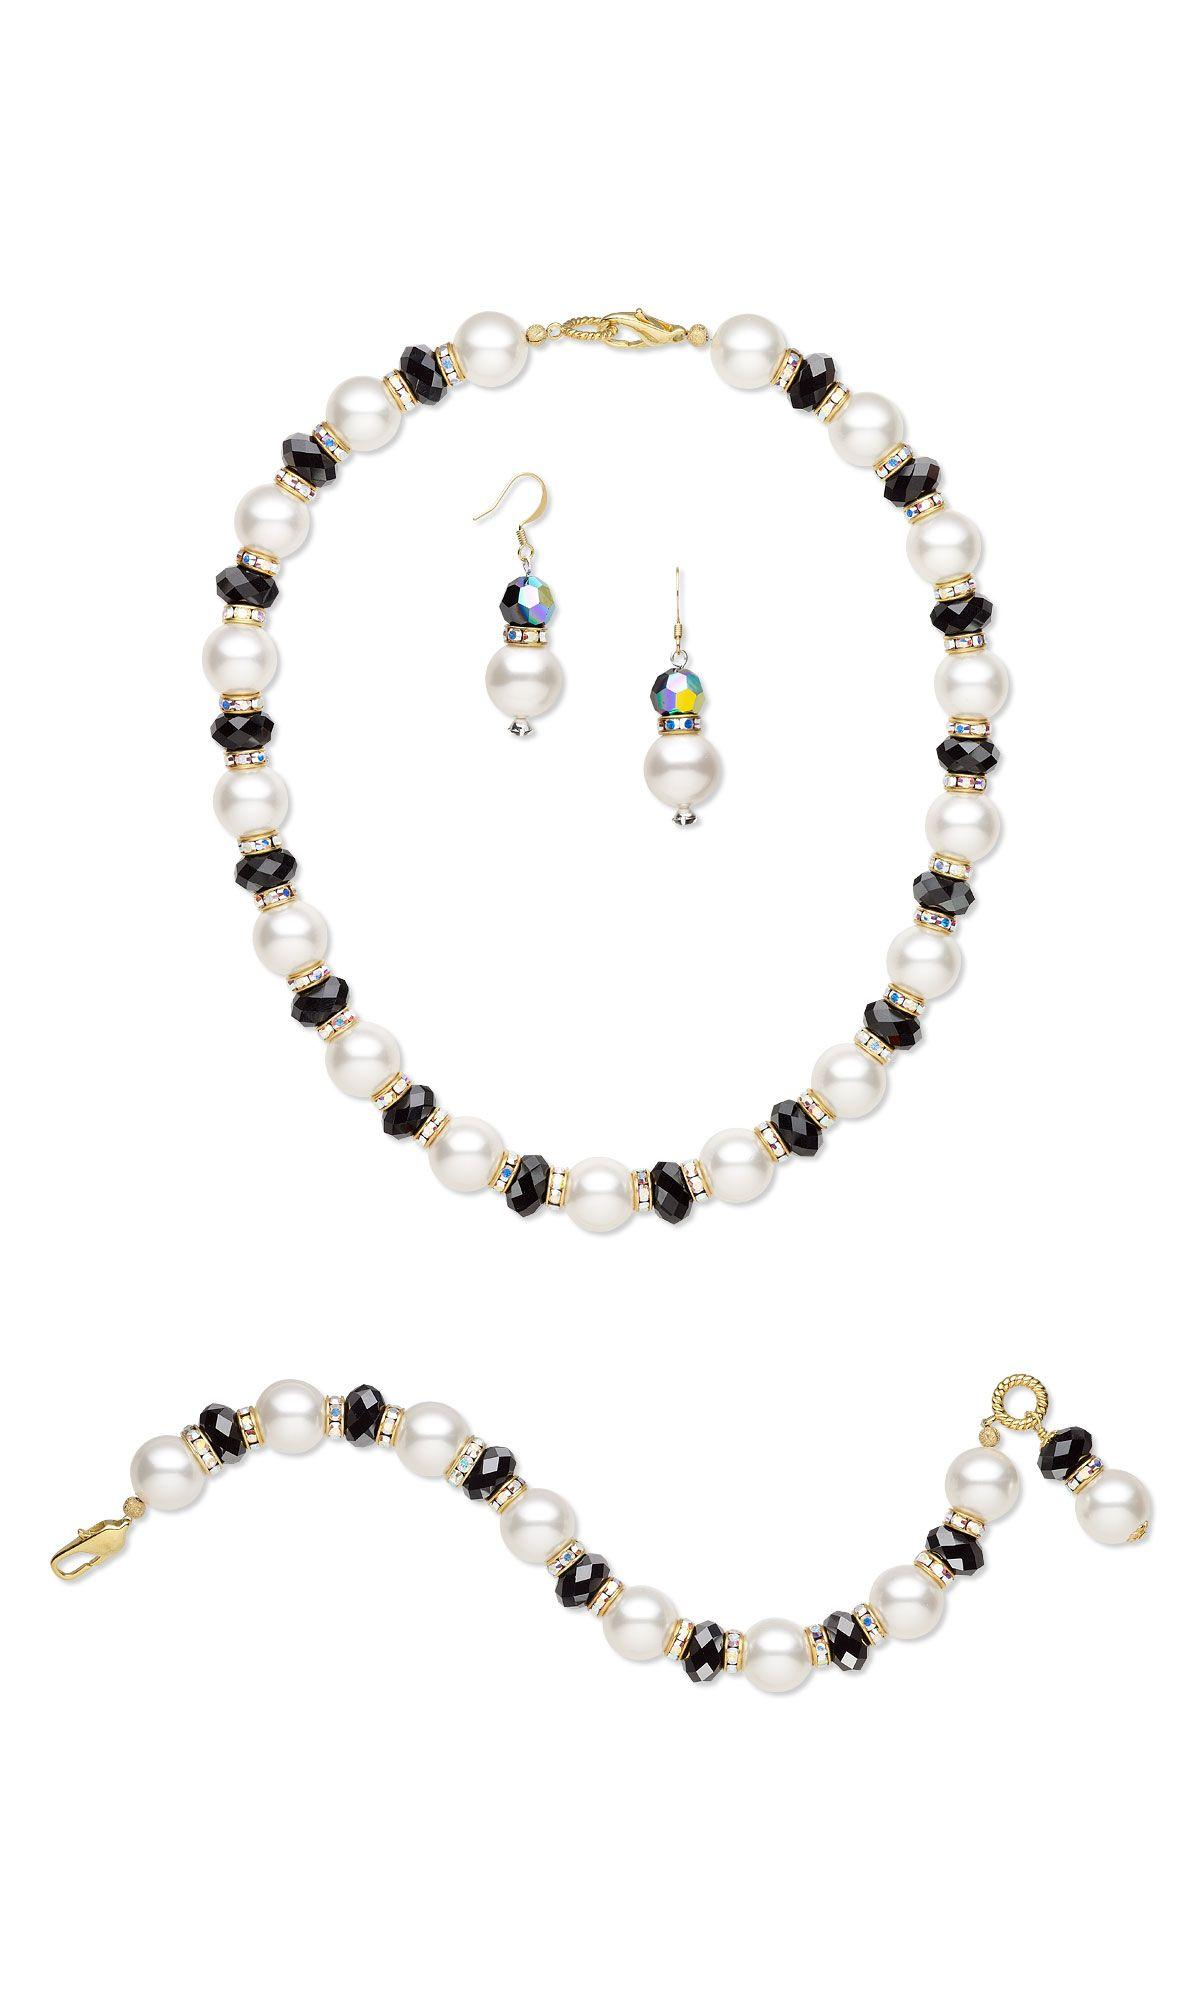 Jewelry design singlestrand necklace bracelet and earring set